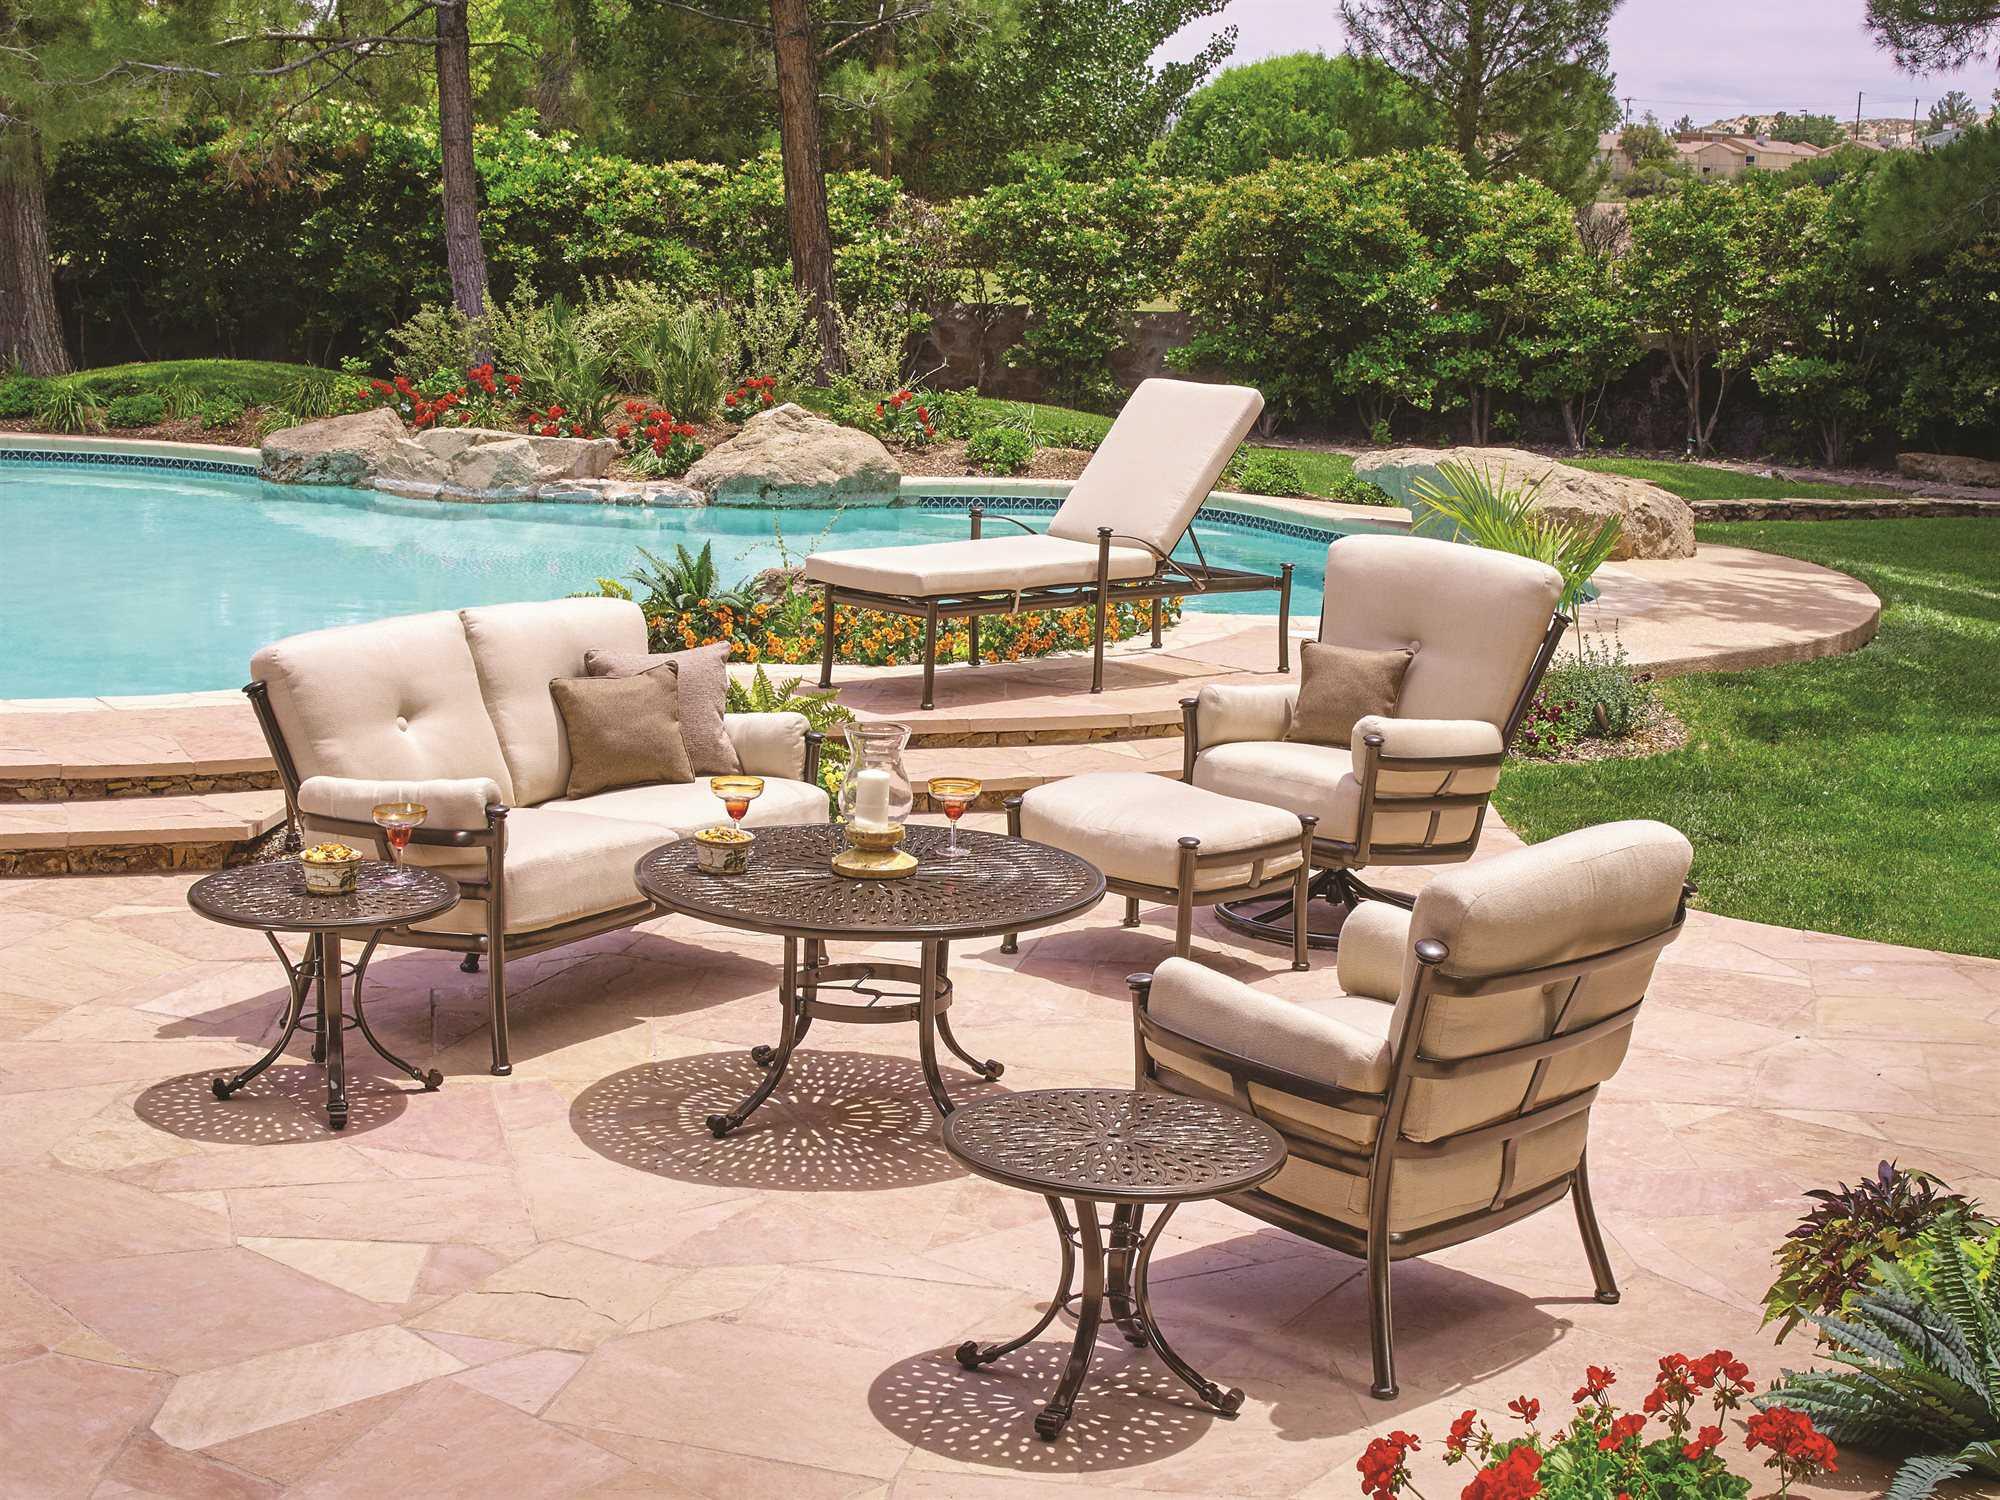 stylish winston patio furniture cushions as encouragement